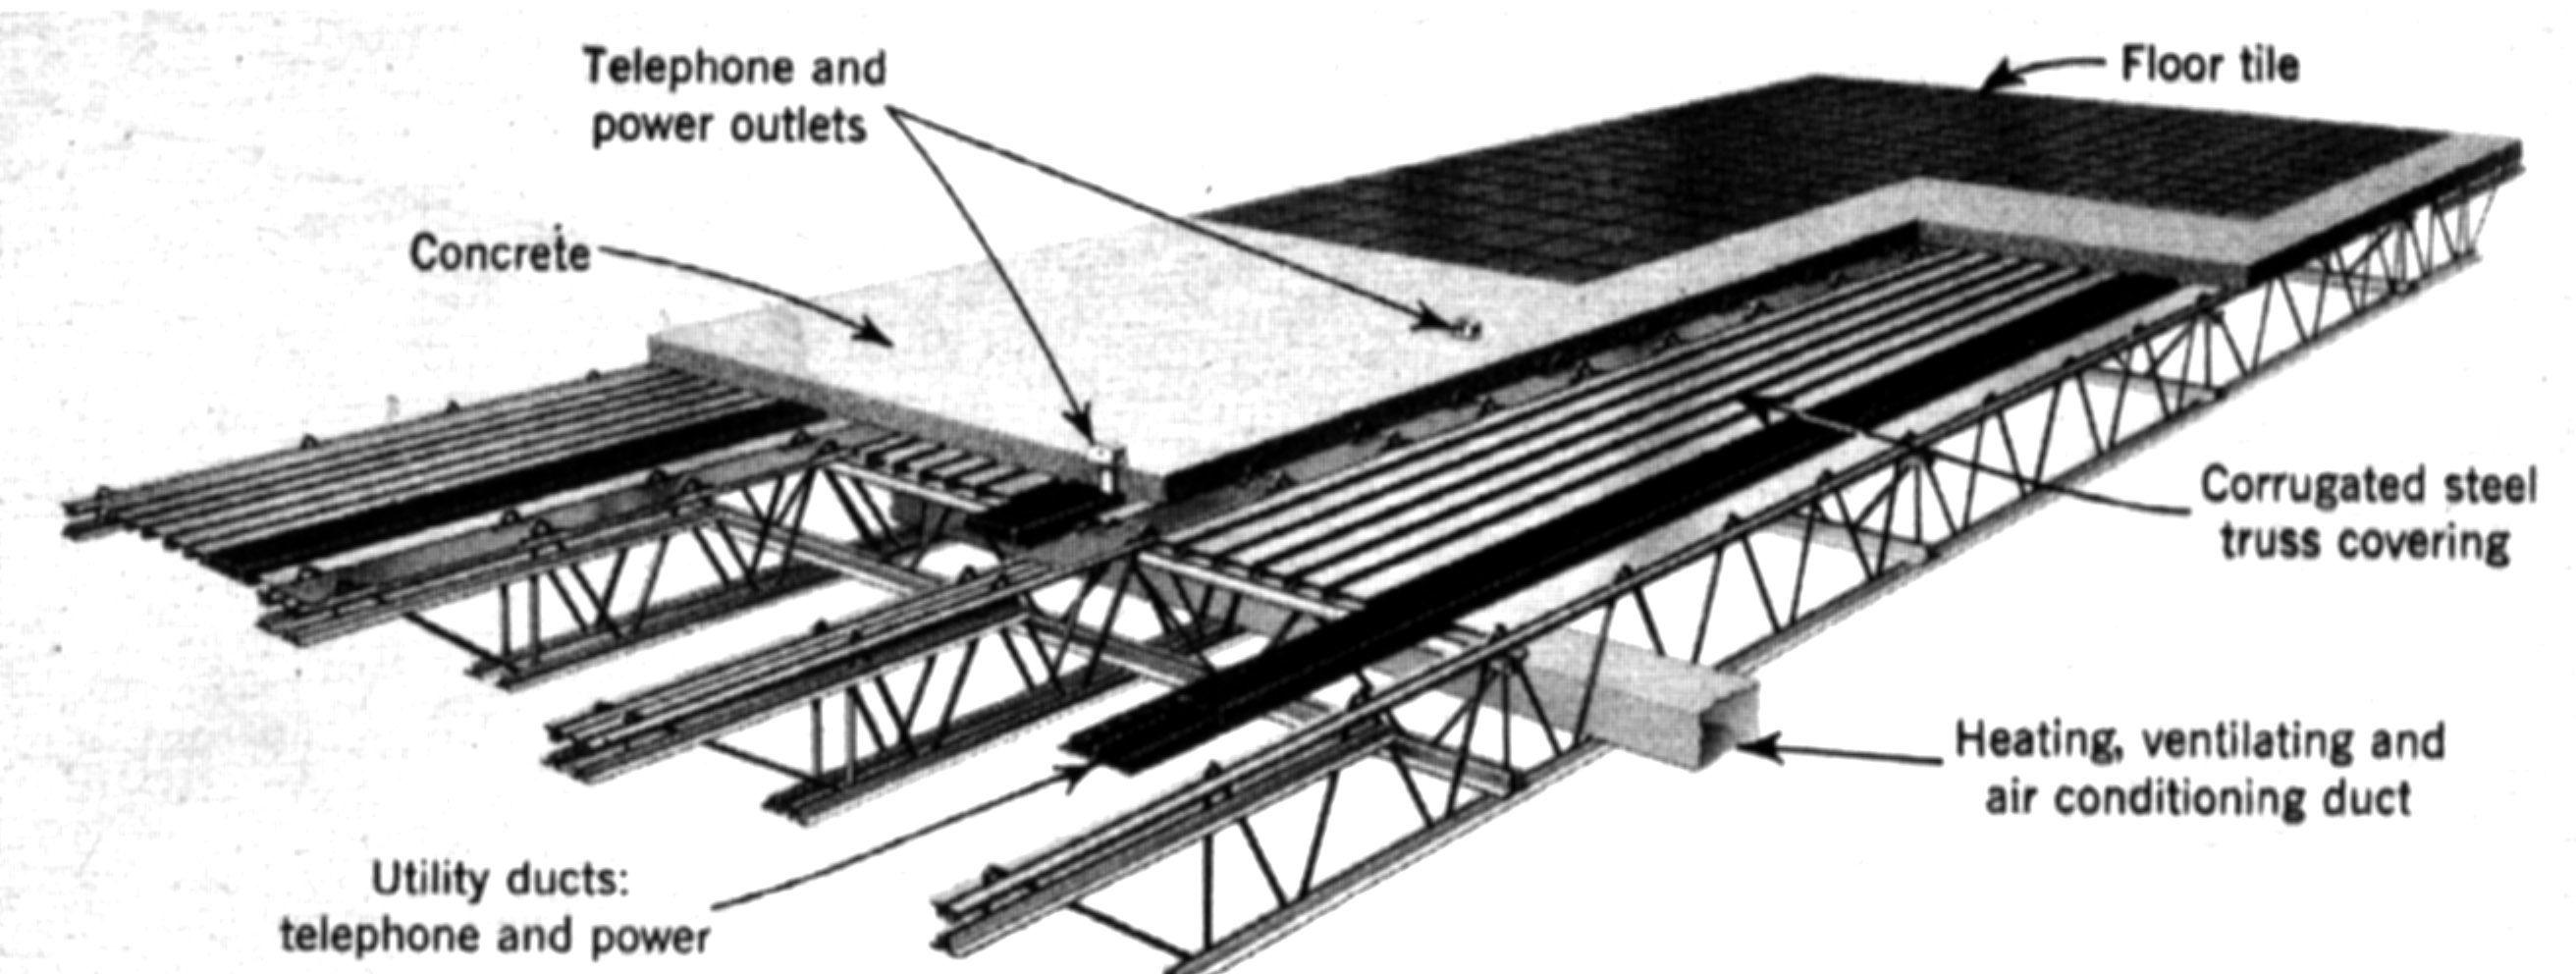 Flat Roof 30 Foot Steel Truss Google Search Dom